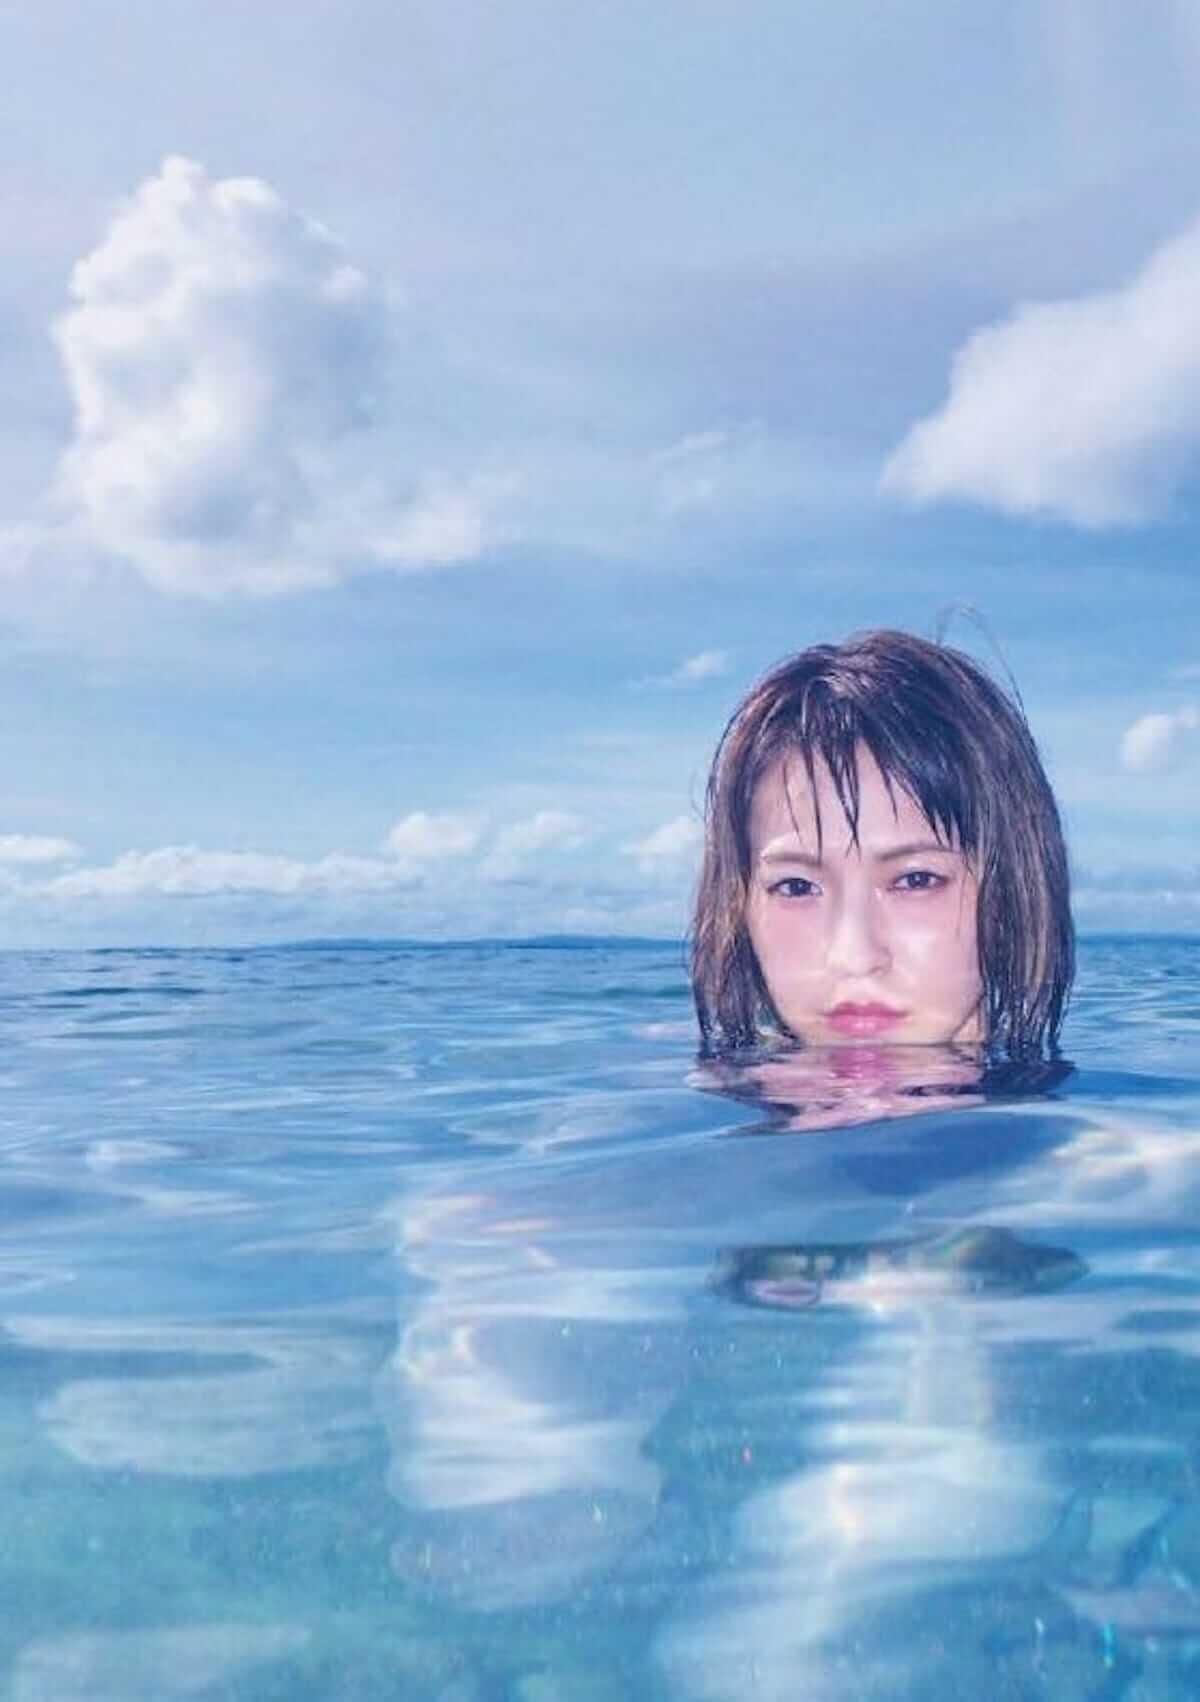 SCANDAL、HARUNAファースト写真集『SOMEWHERE』少女のような笑顔から大人の表情までを見せる! art180713_scandal-haruna_1-1200x1702